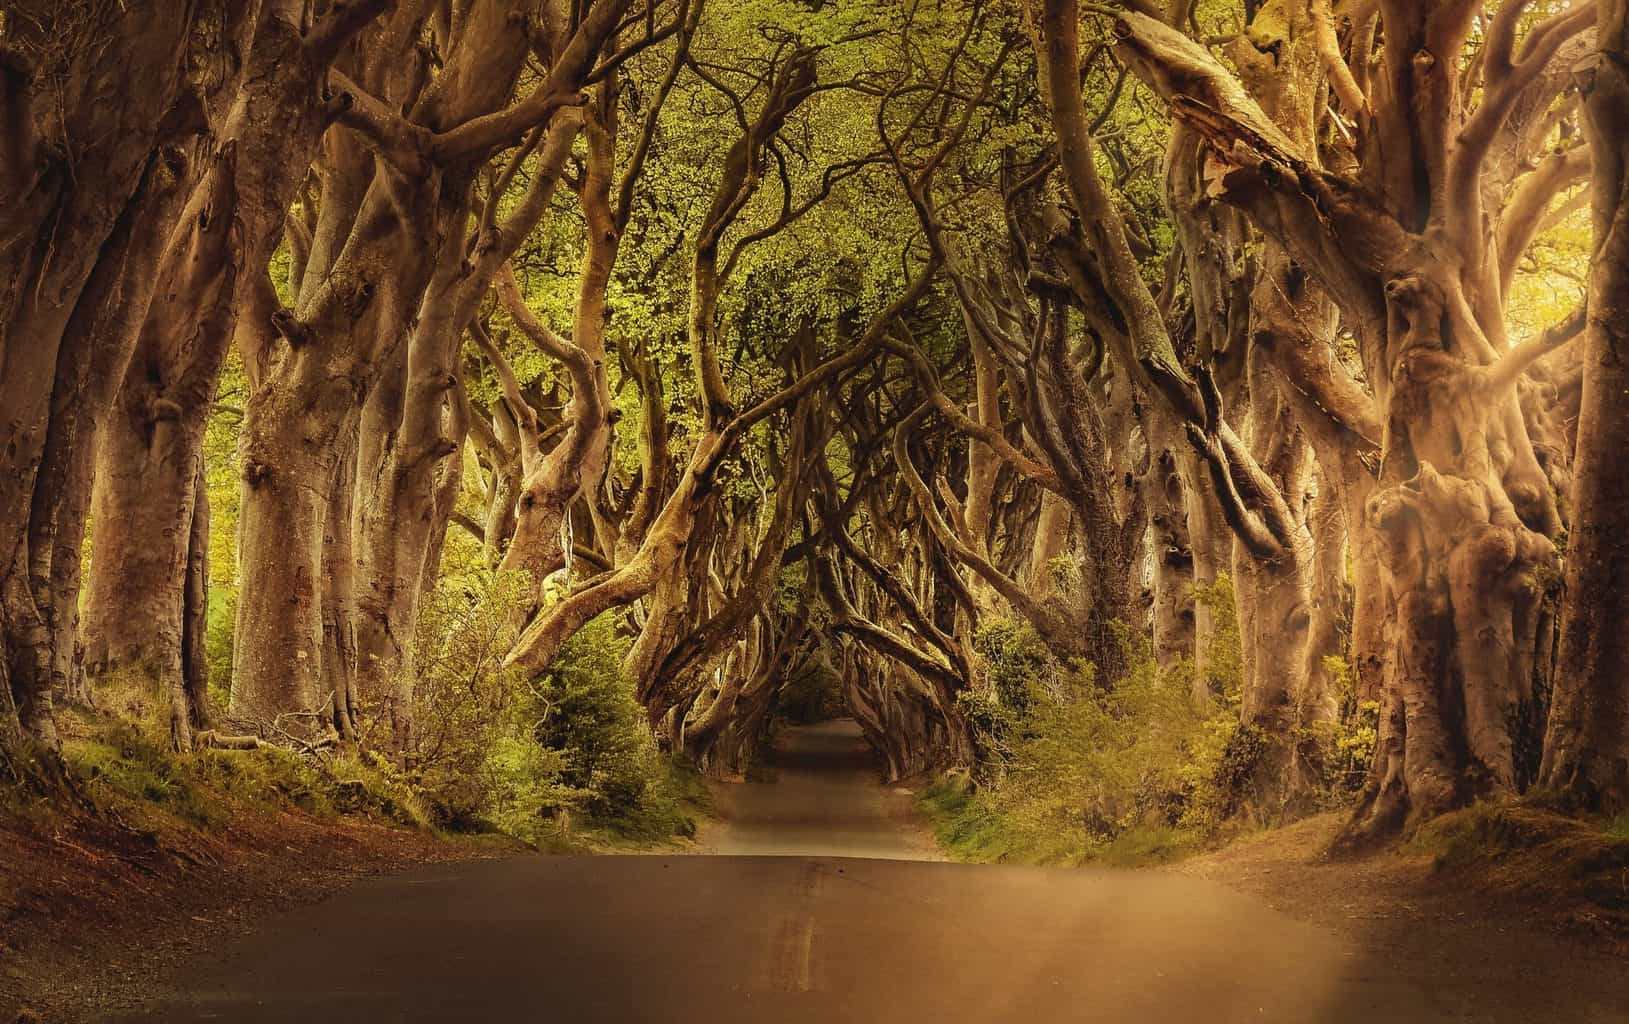 trees, avenue, road